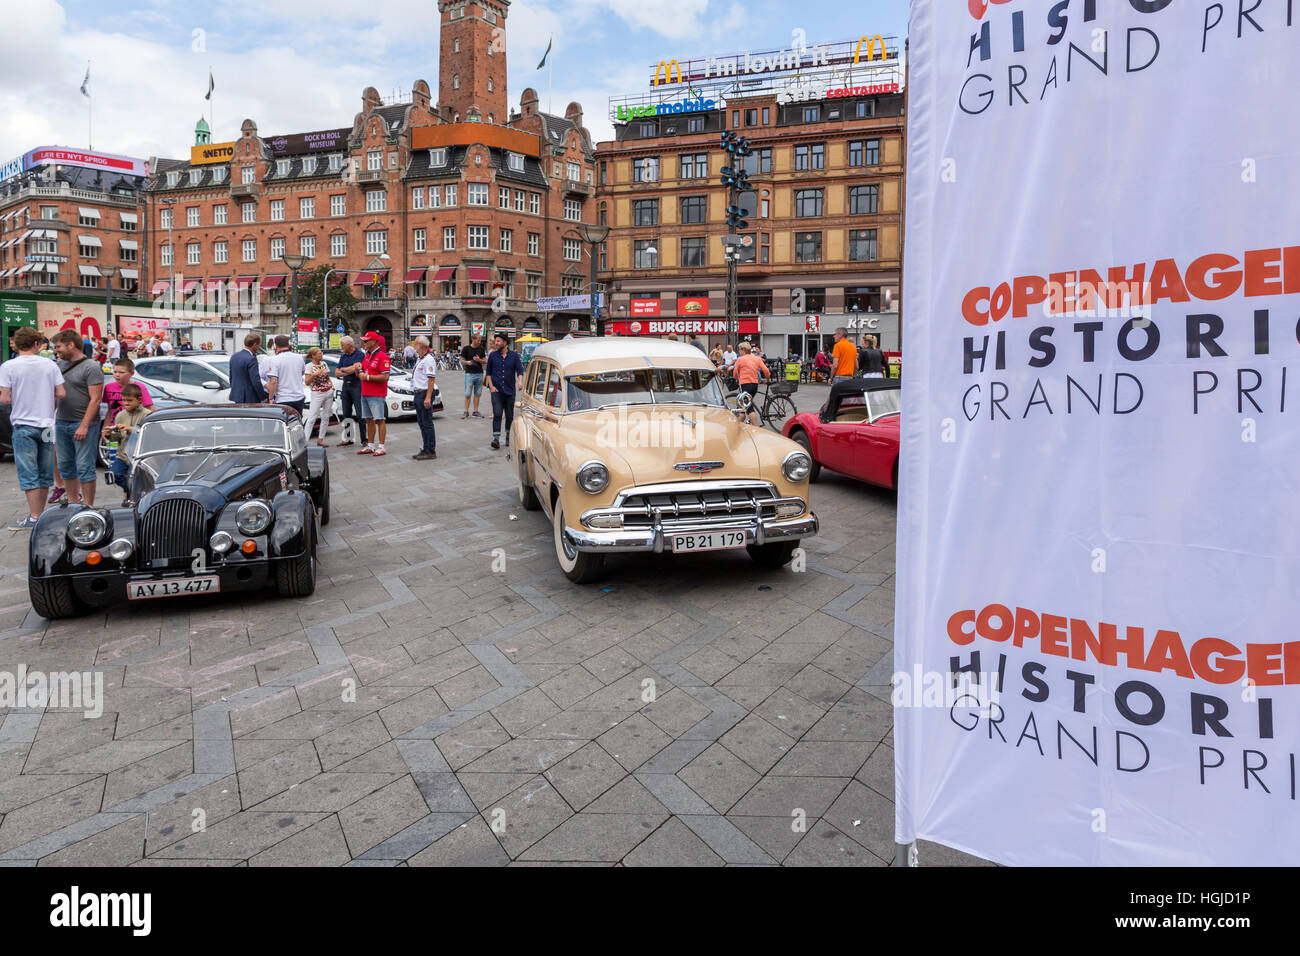 Old race cars drives in front of Copenhagen City Hall Square, Copenhagen Historic Grand Prix reception, Denmark - Stock Image